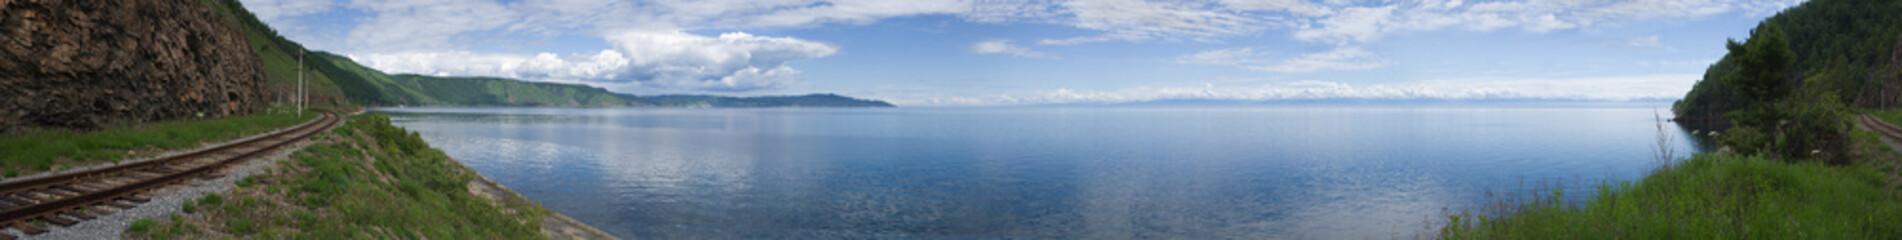 Panoramic photo of lake Baikal